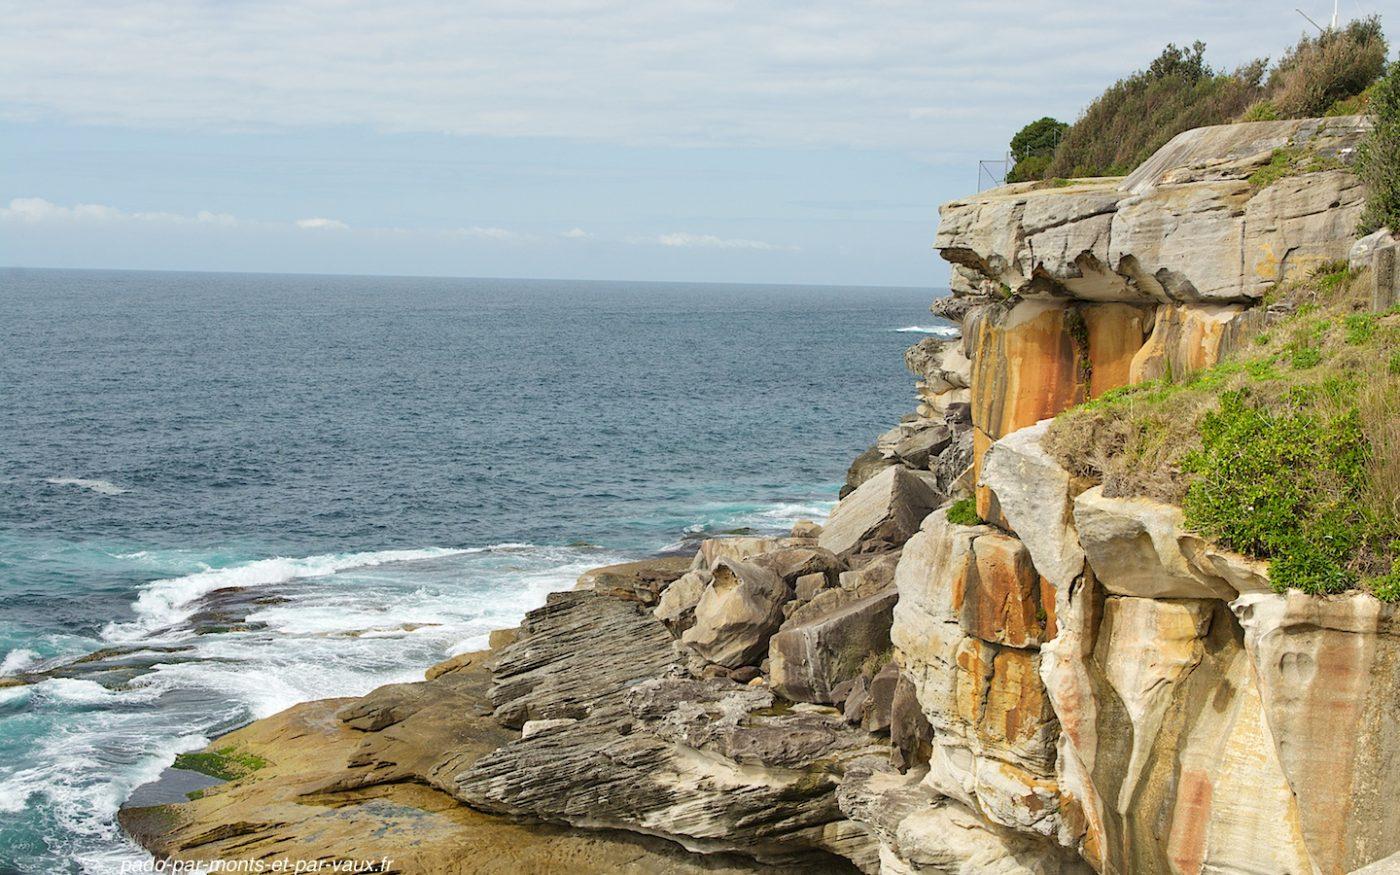 Watsons bay - South Head Heritage Trail